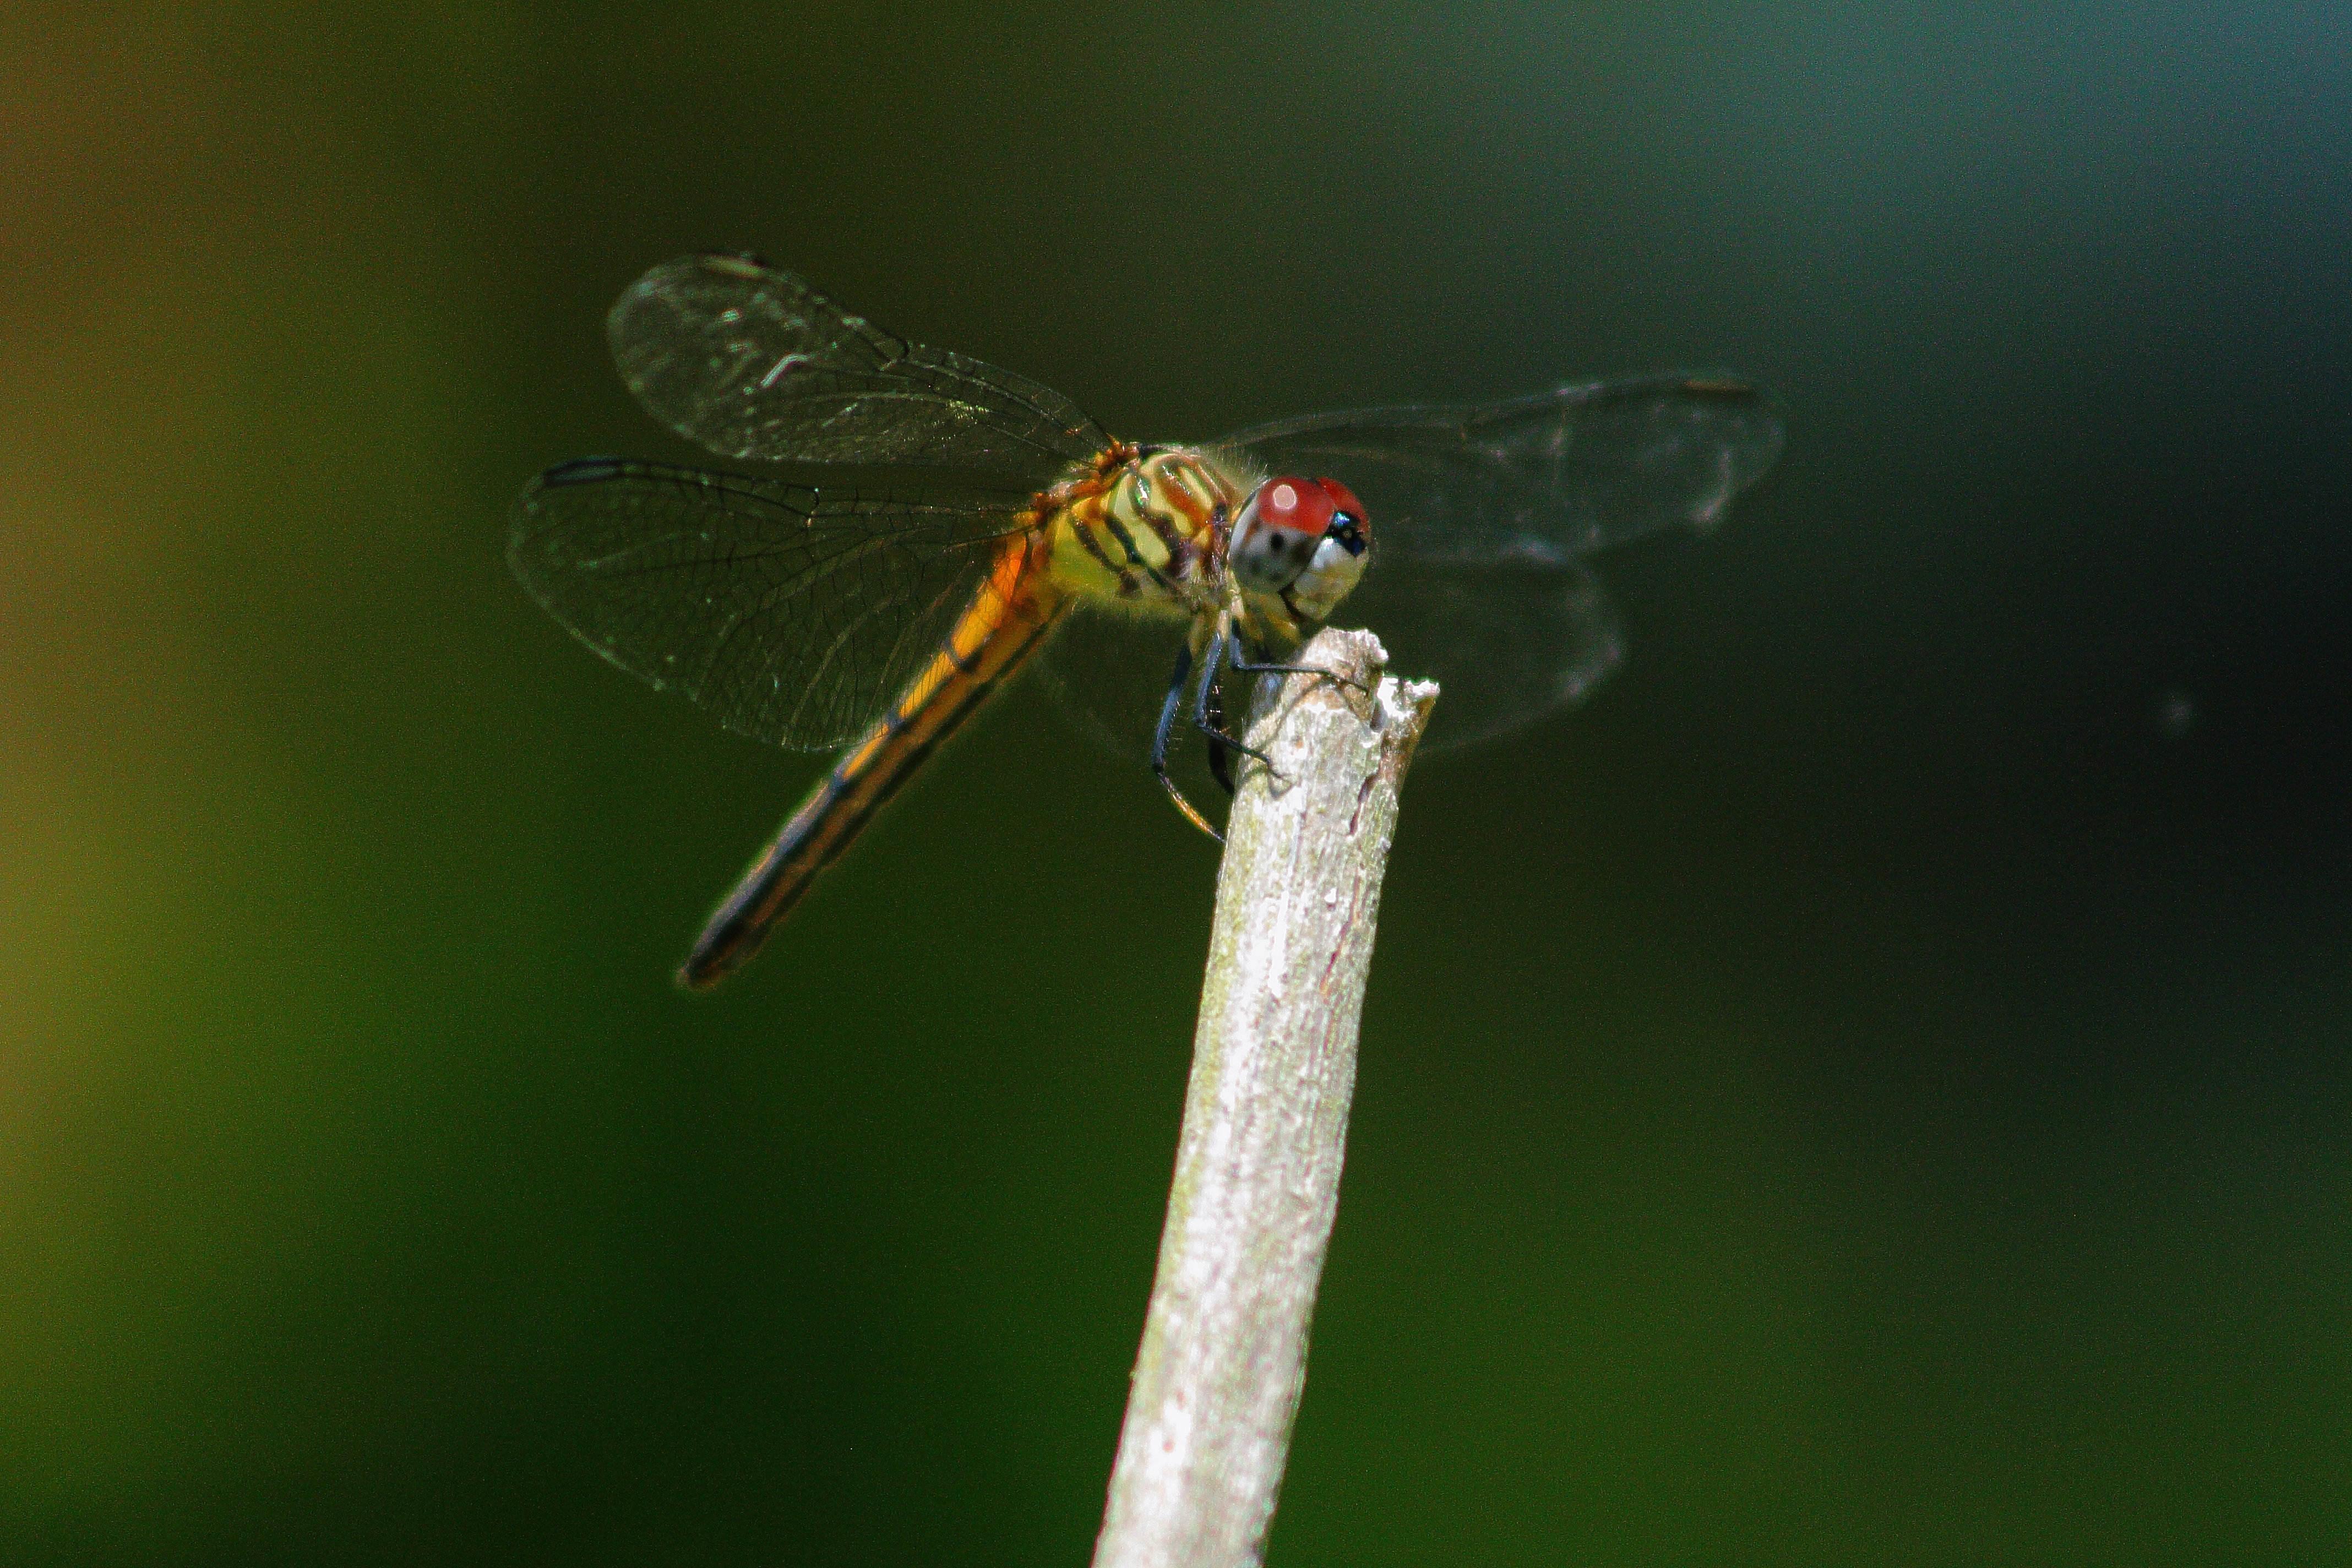 IMG_8859_Dragonfly.jpg